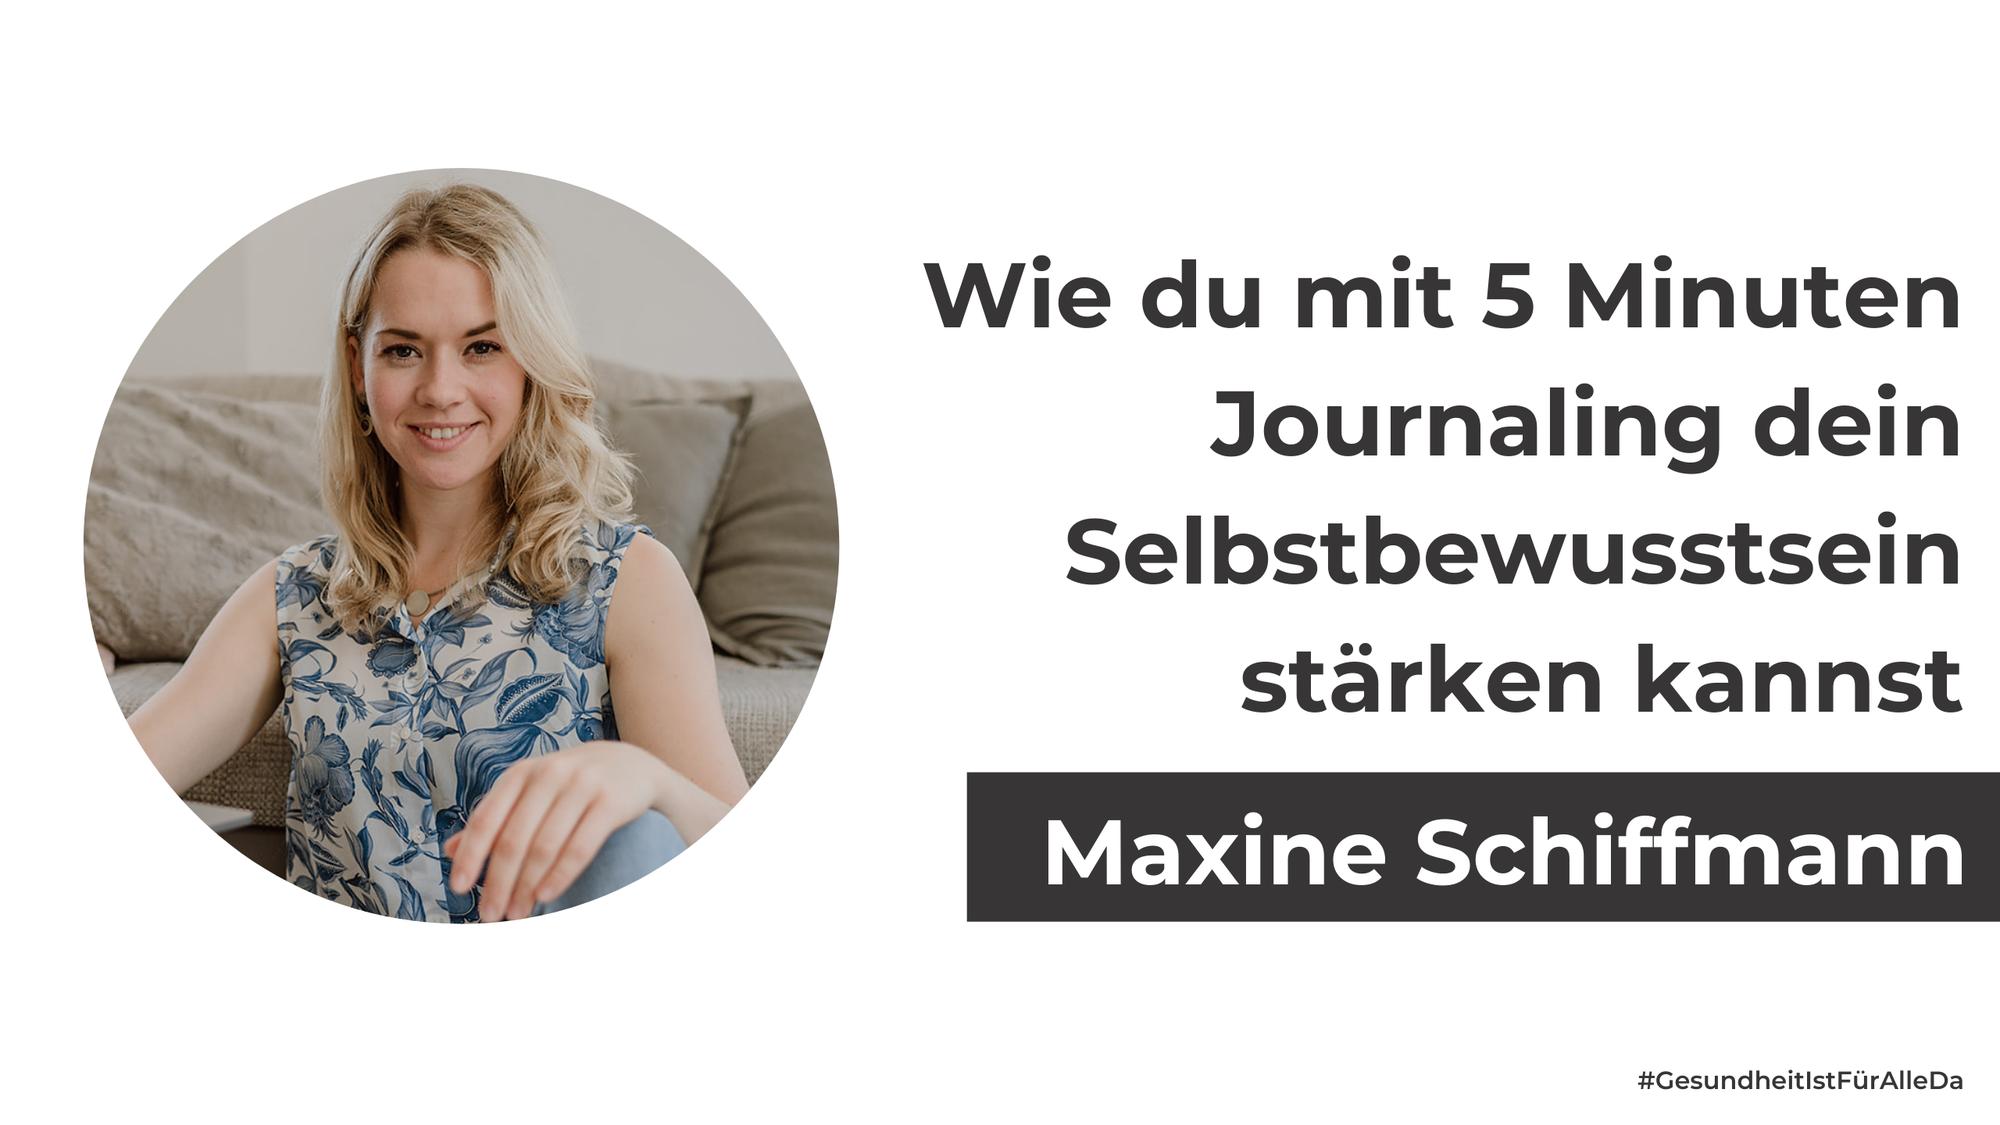 Maxine Schiffmann